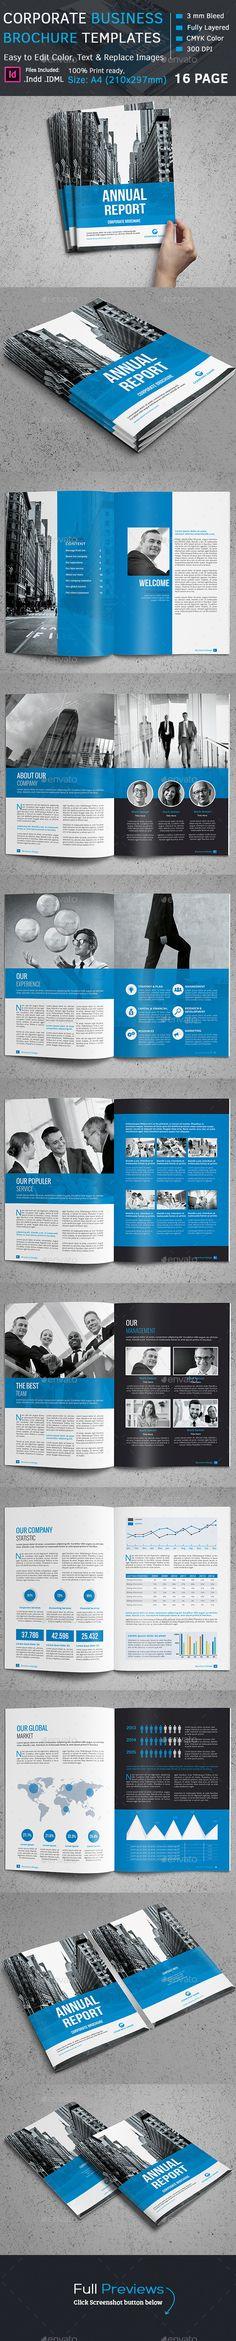 90 best верстка images on pinterest editorial design page layout